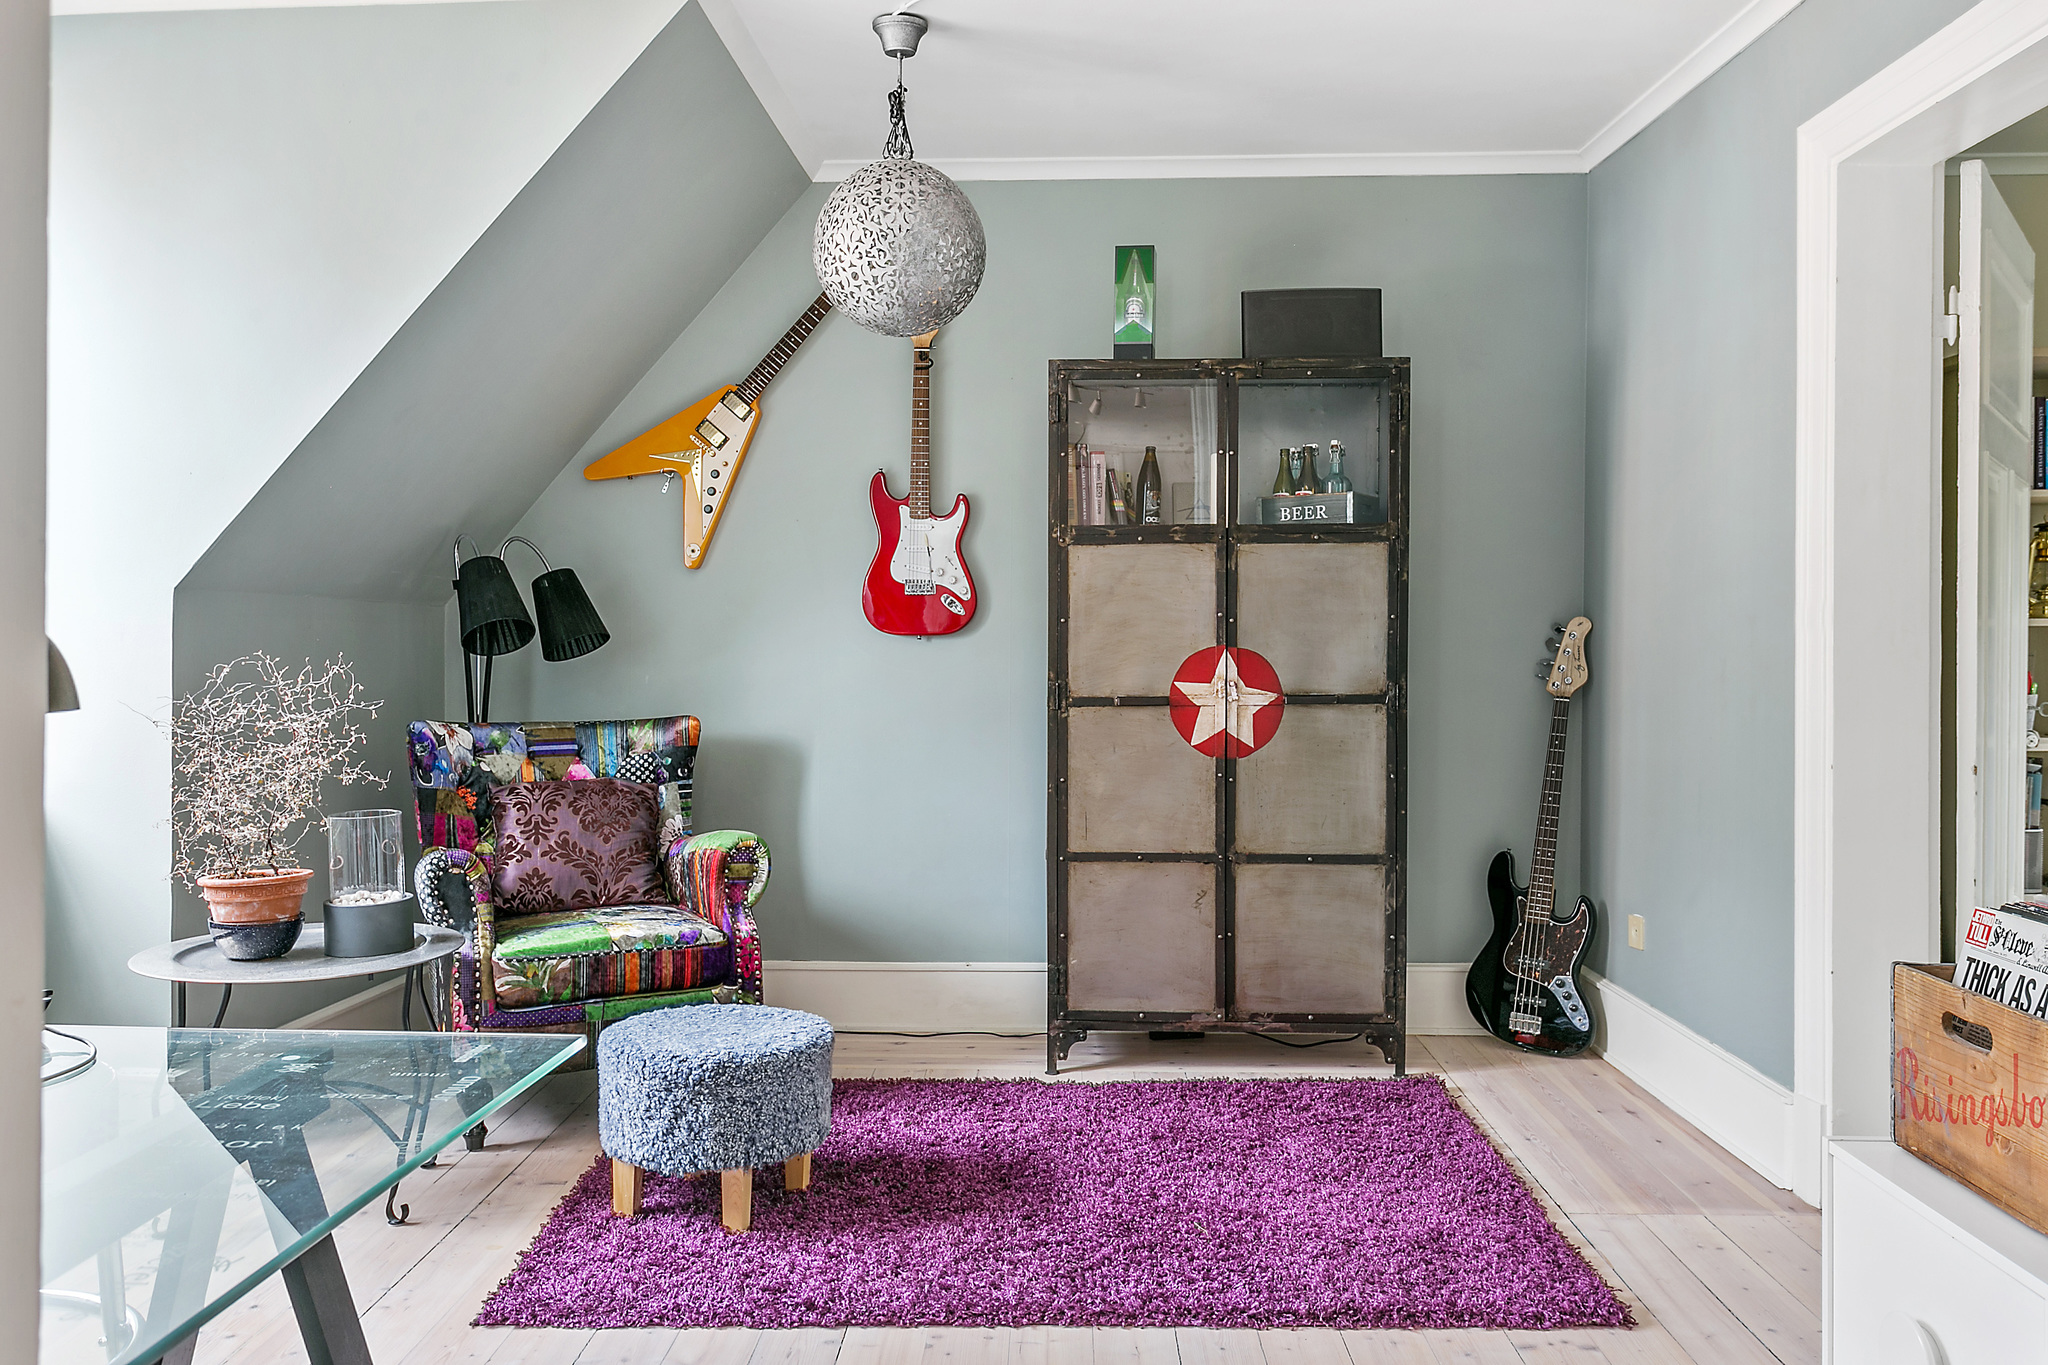 детская комната кресло пэчворк ковер шкаф гитары мансарда